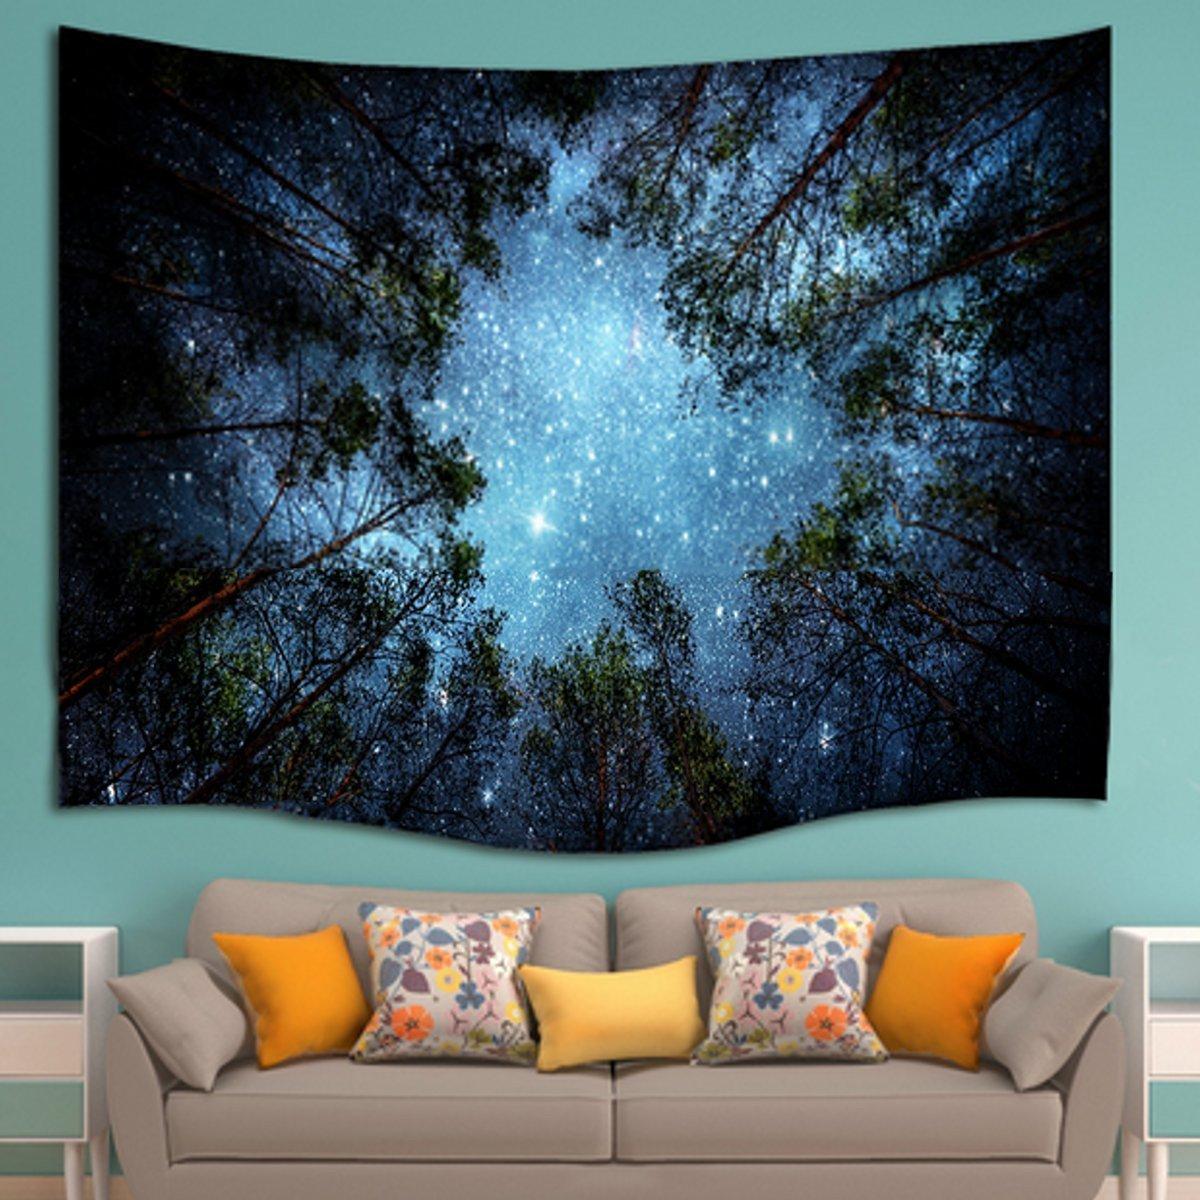 Amazoncom KCASA Forest Starry Sky Mandala Tapestry